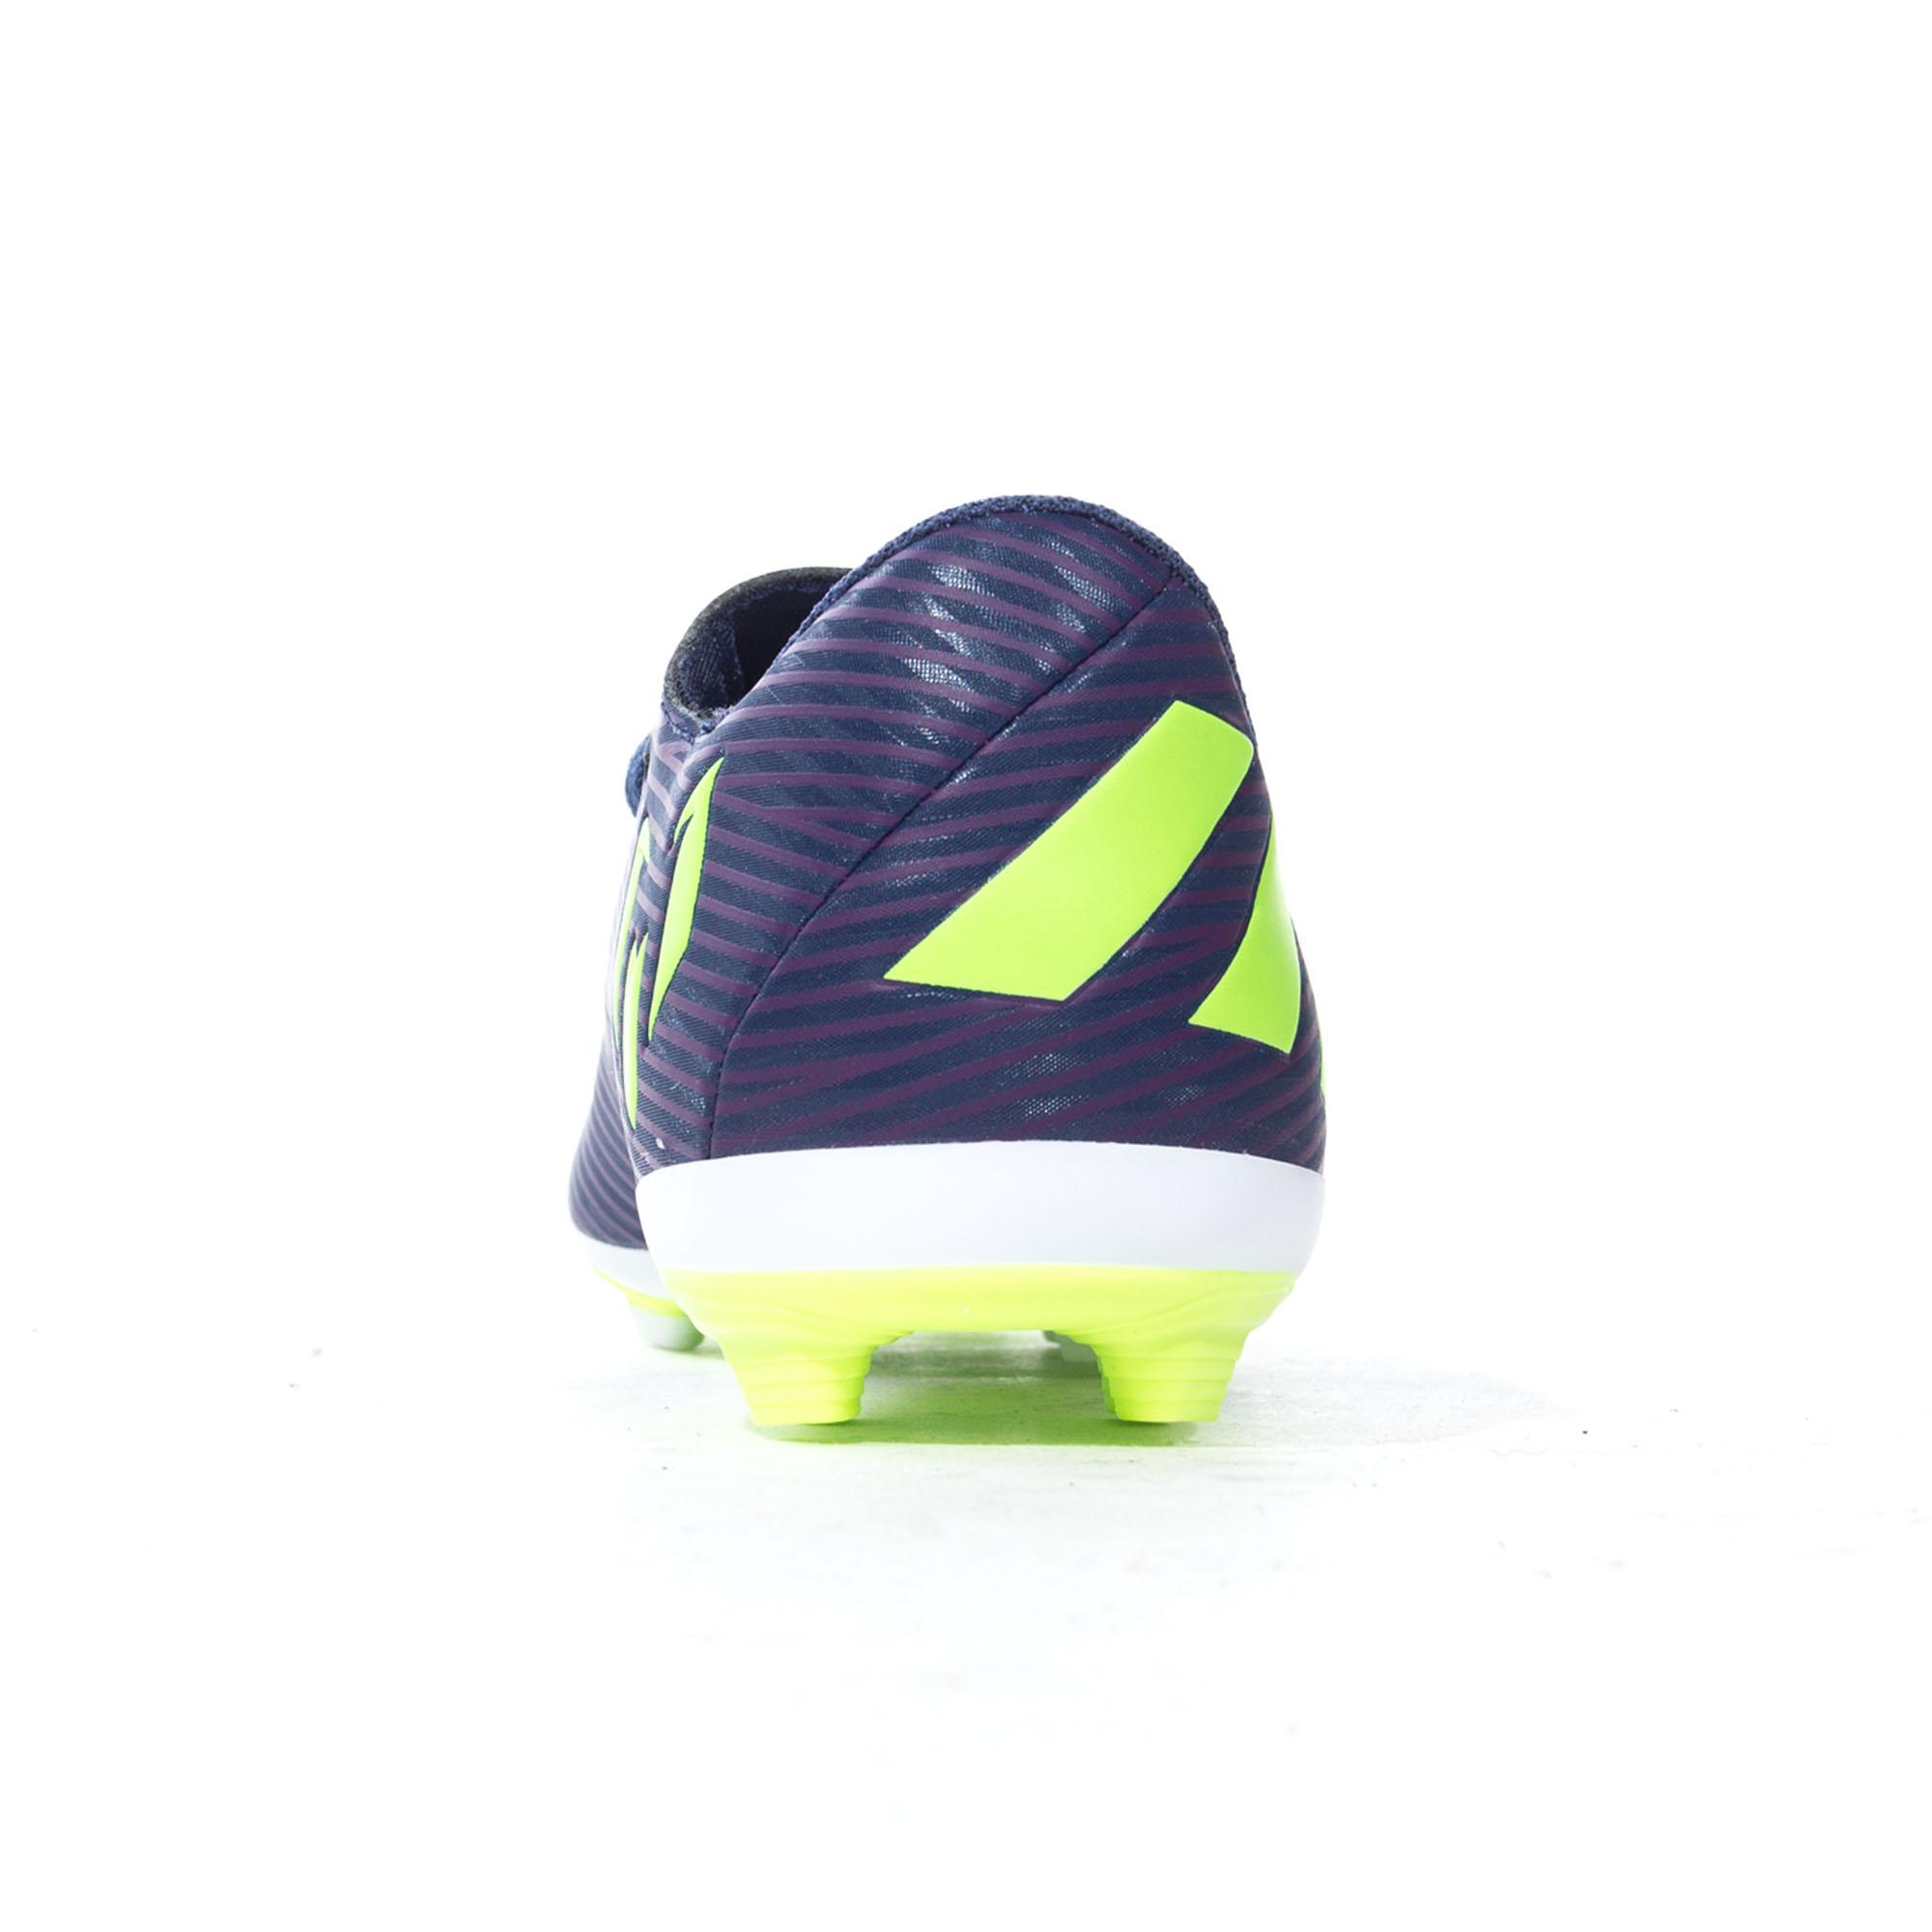 Adidas-nemeziz-Messi-19-4-FXG-Terre-Ferme-Enfants-Football-Soccer-Boot-Purple miniature 10